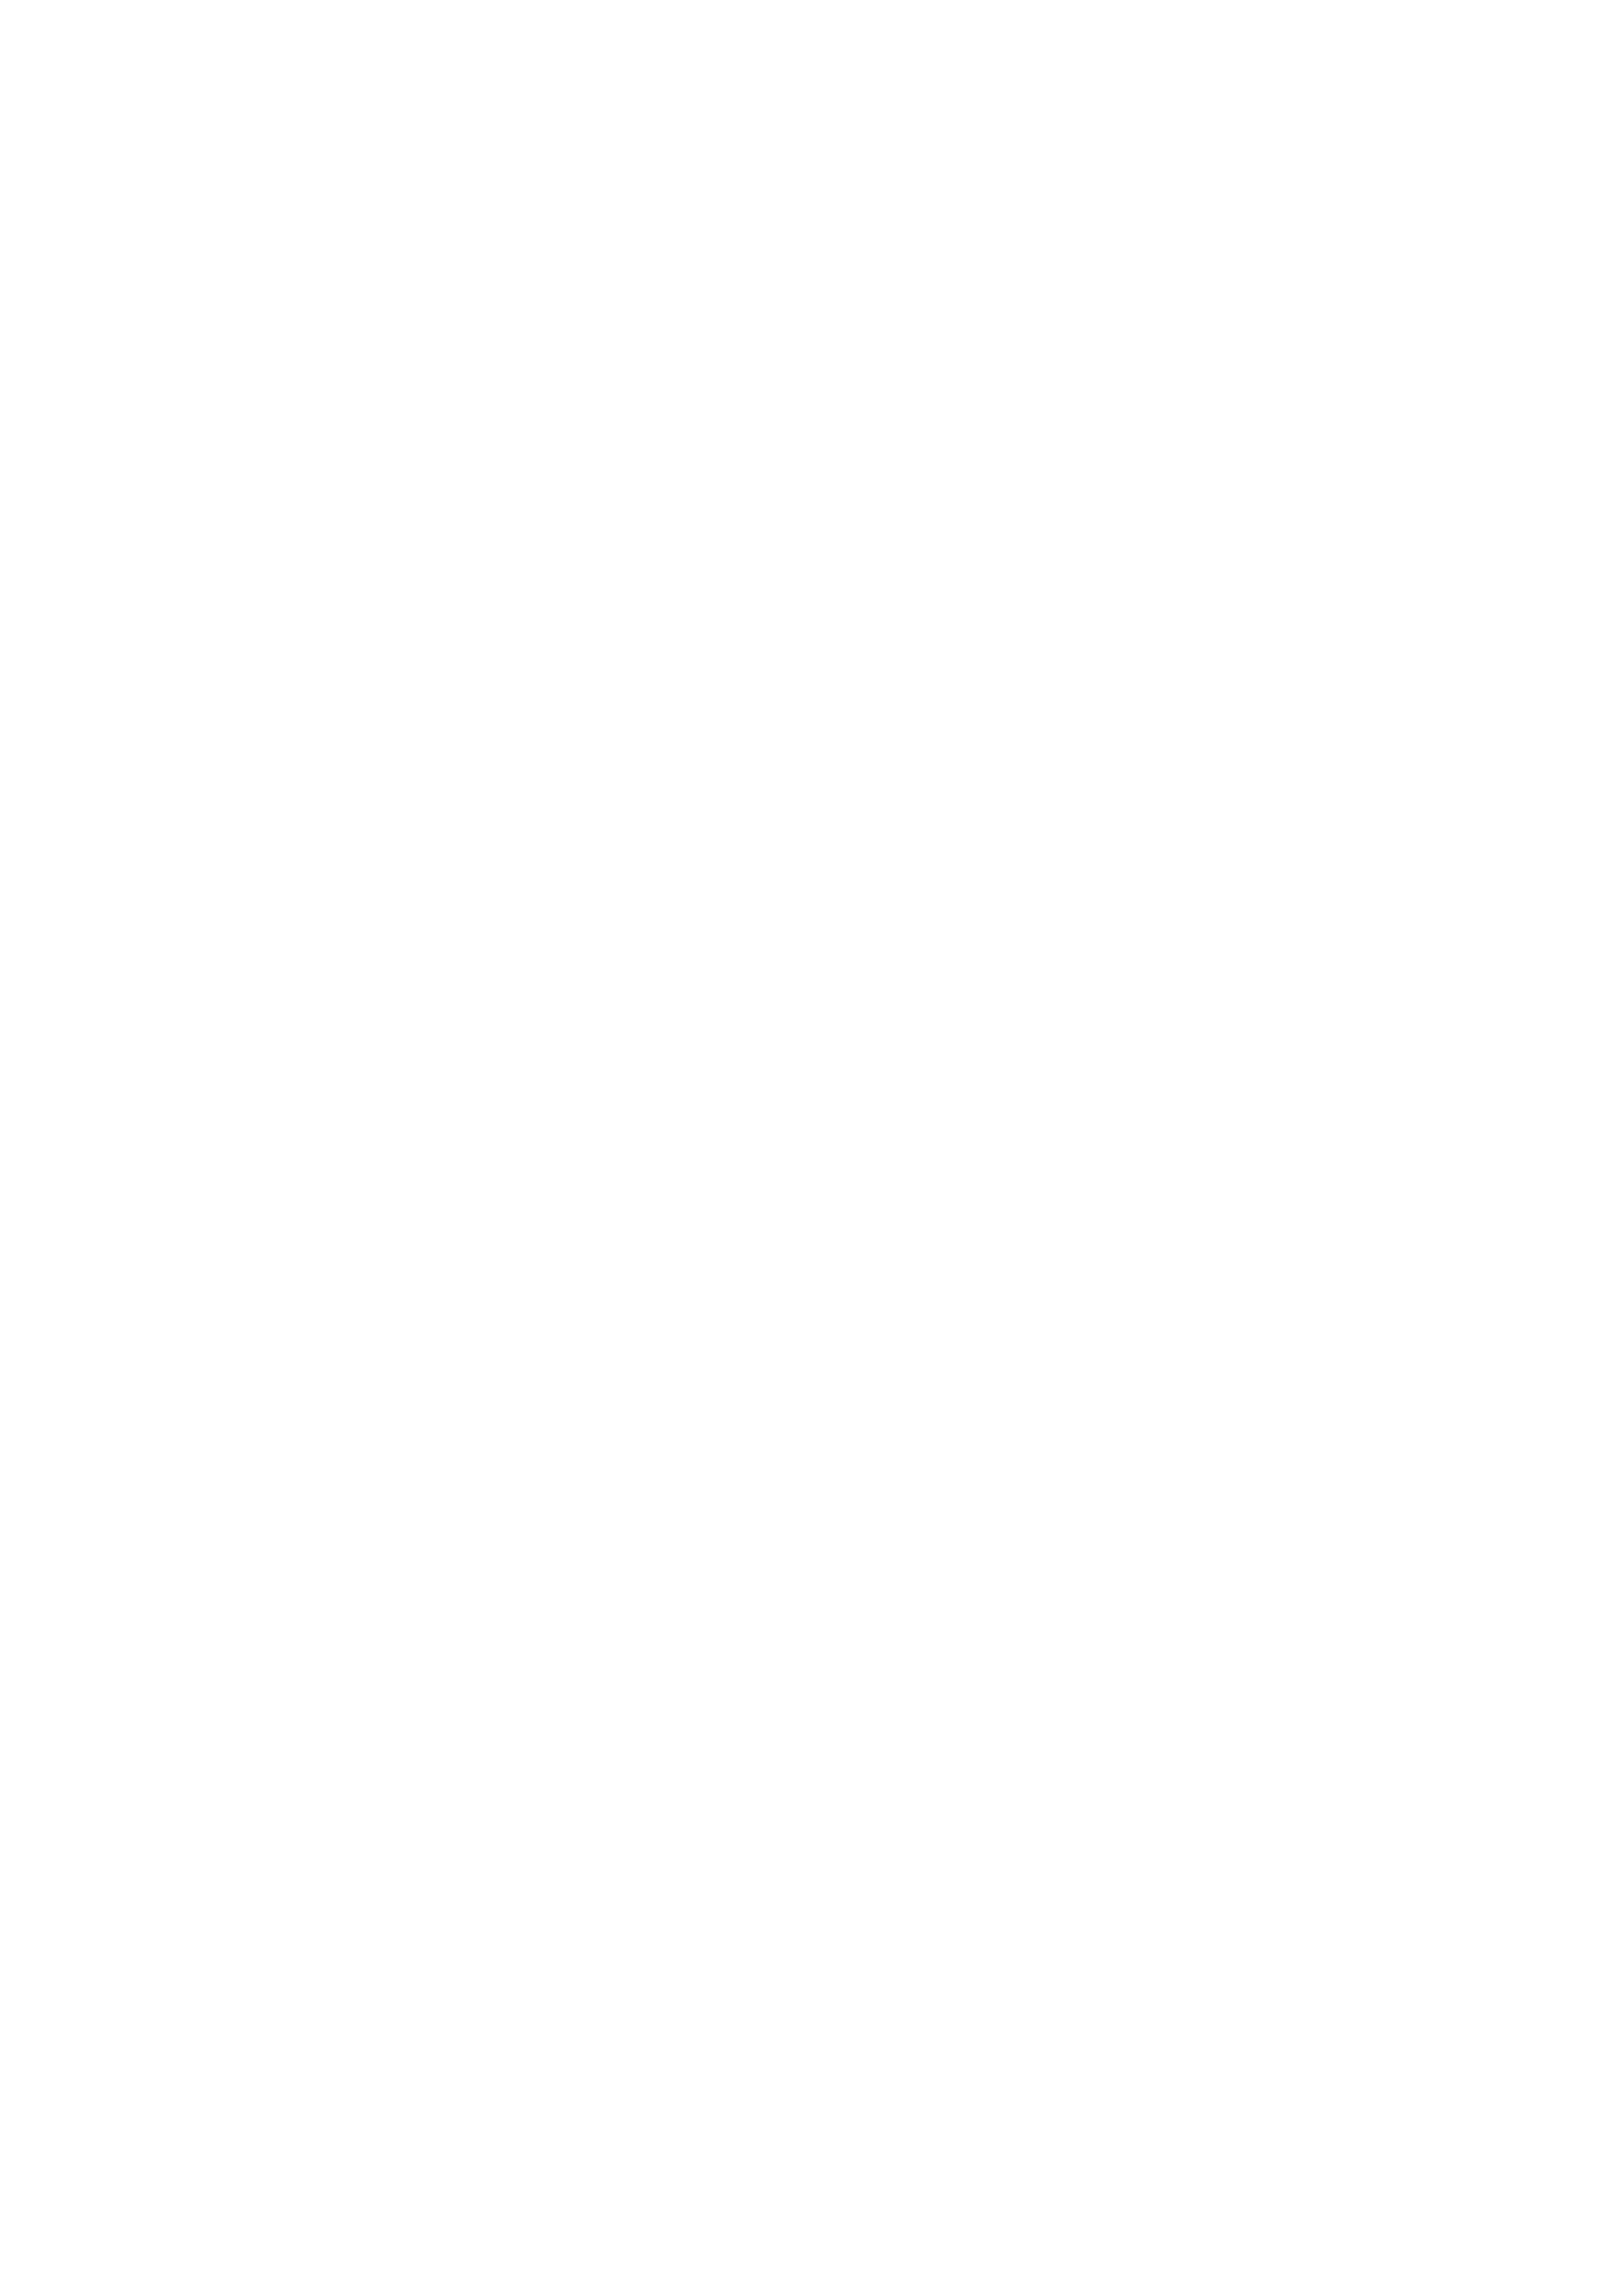 Emblem Black University of Oklahoma OU Auto Accessories.